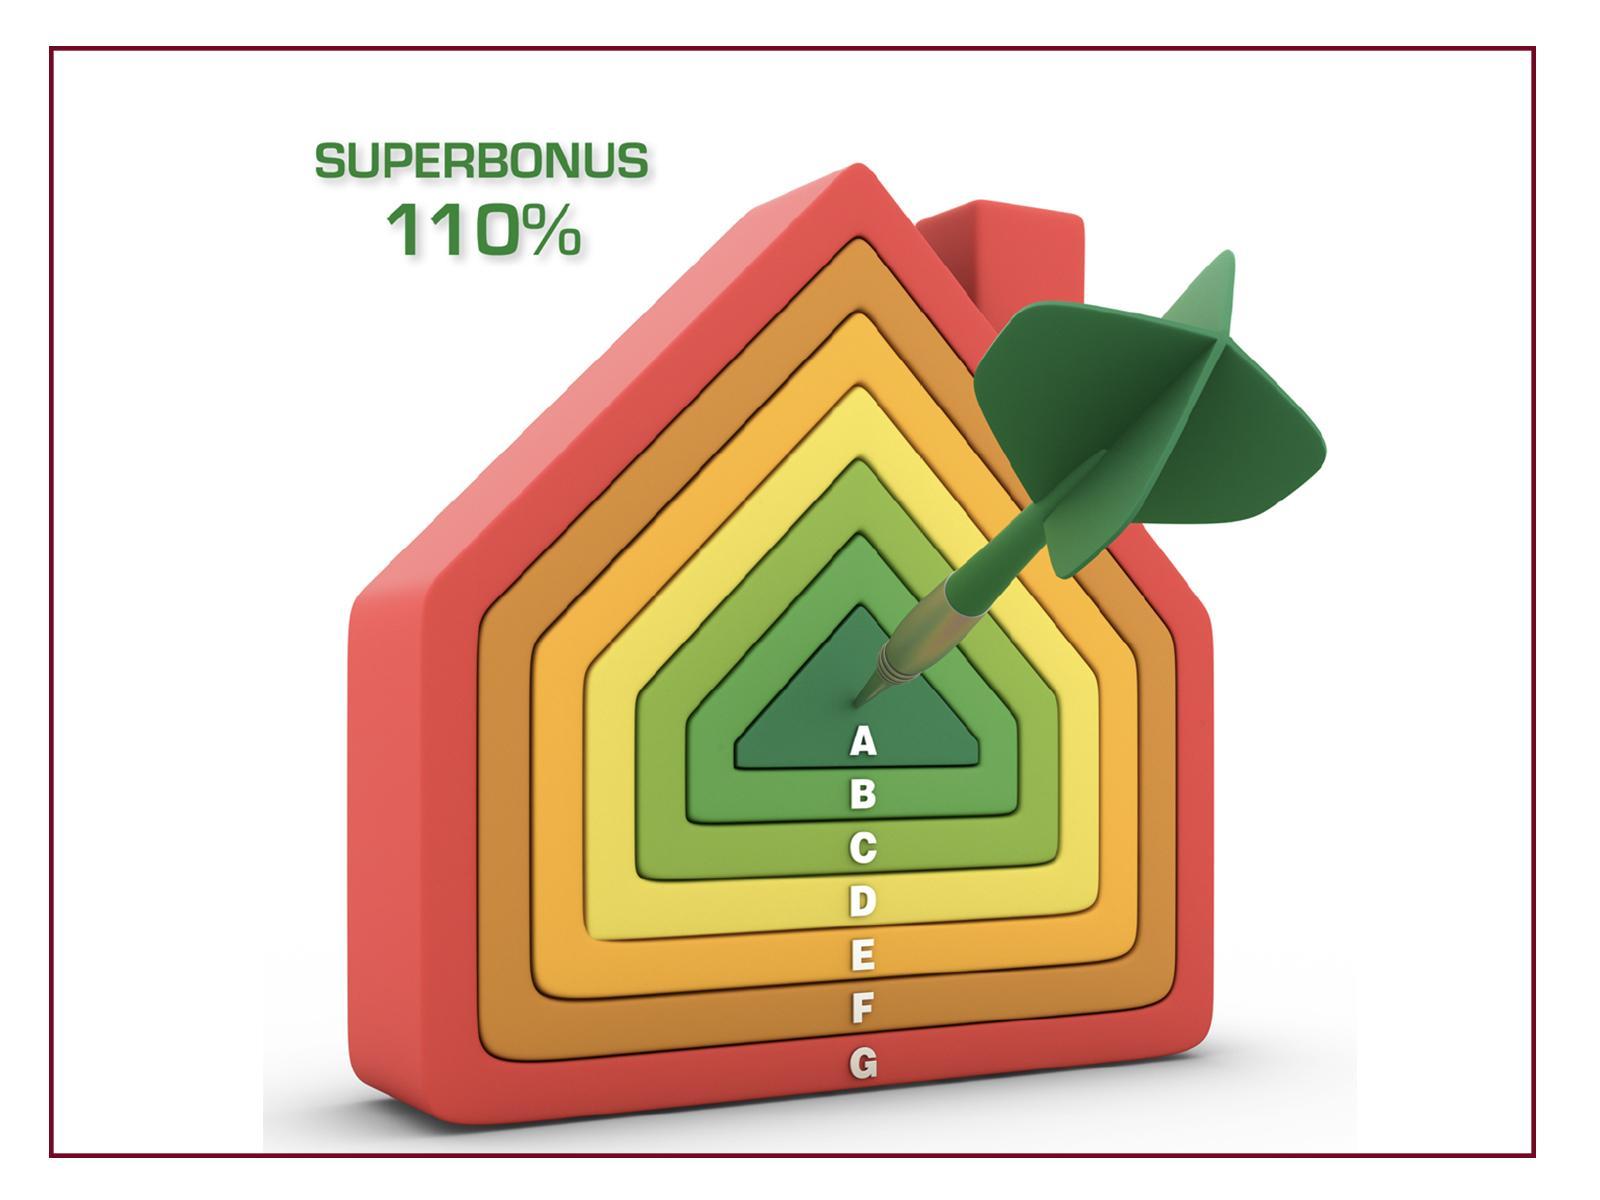 110% SUPERBONUS